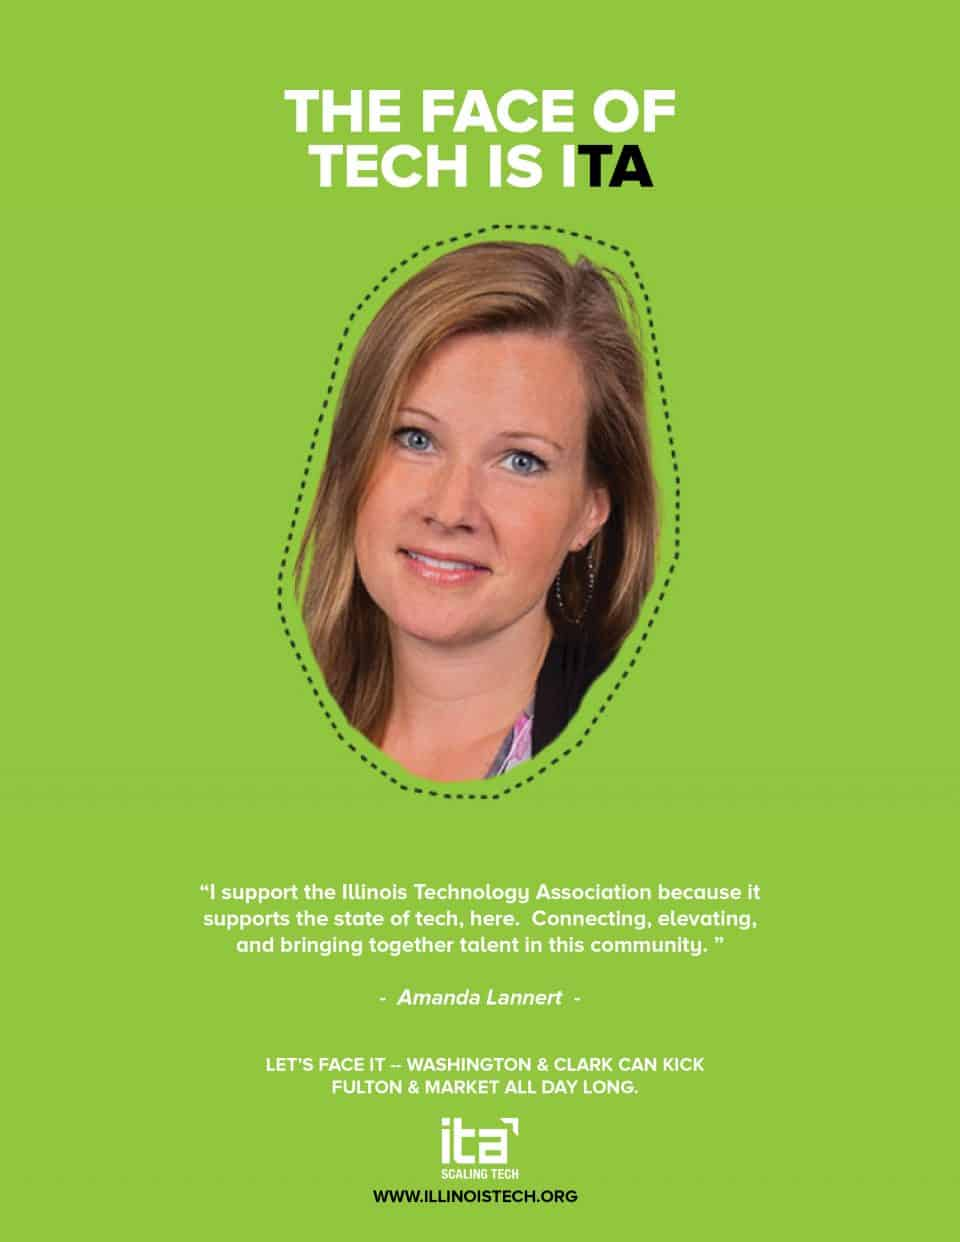 ITAFaceofTech Amanda Lannert